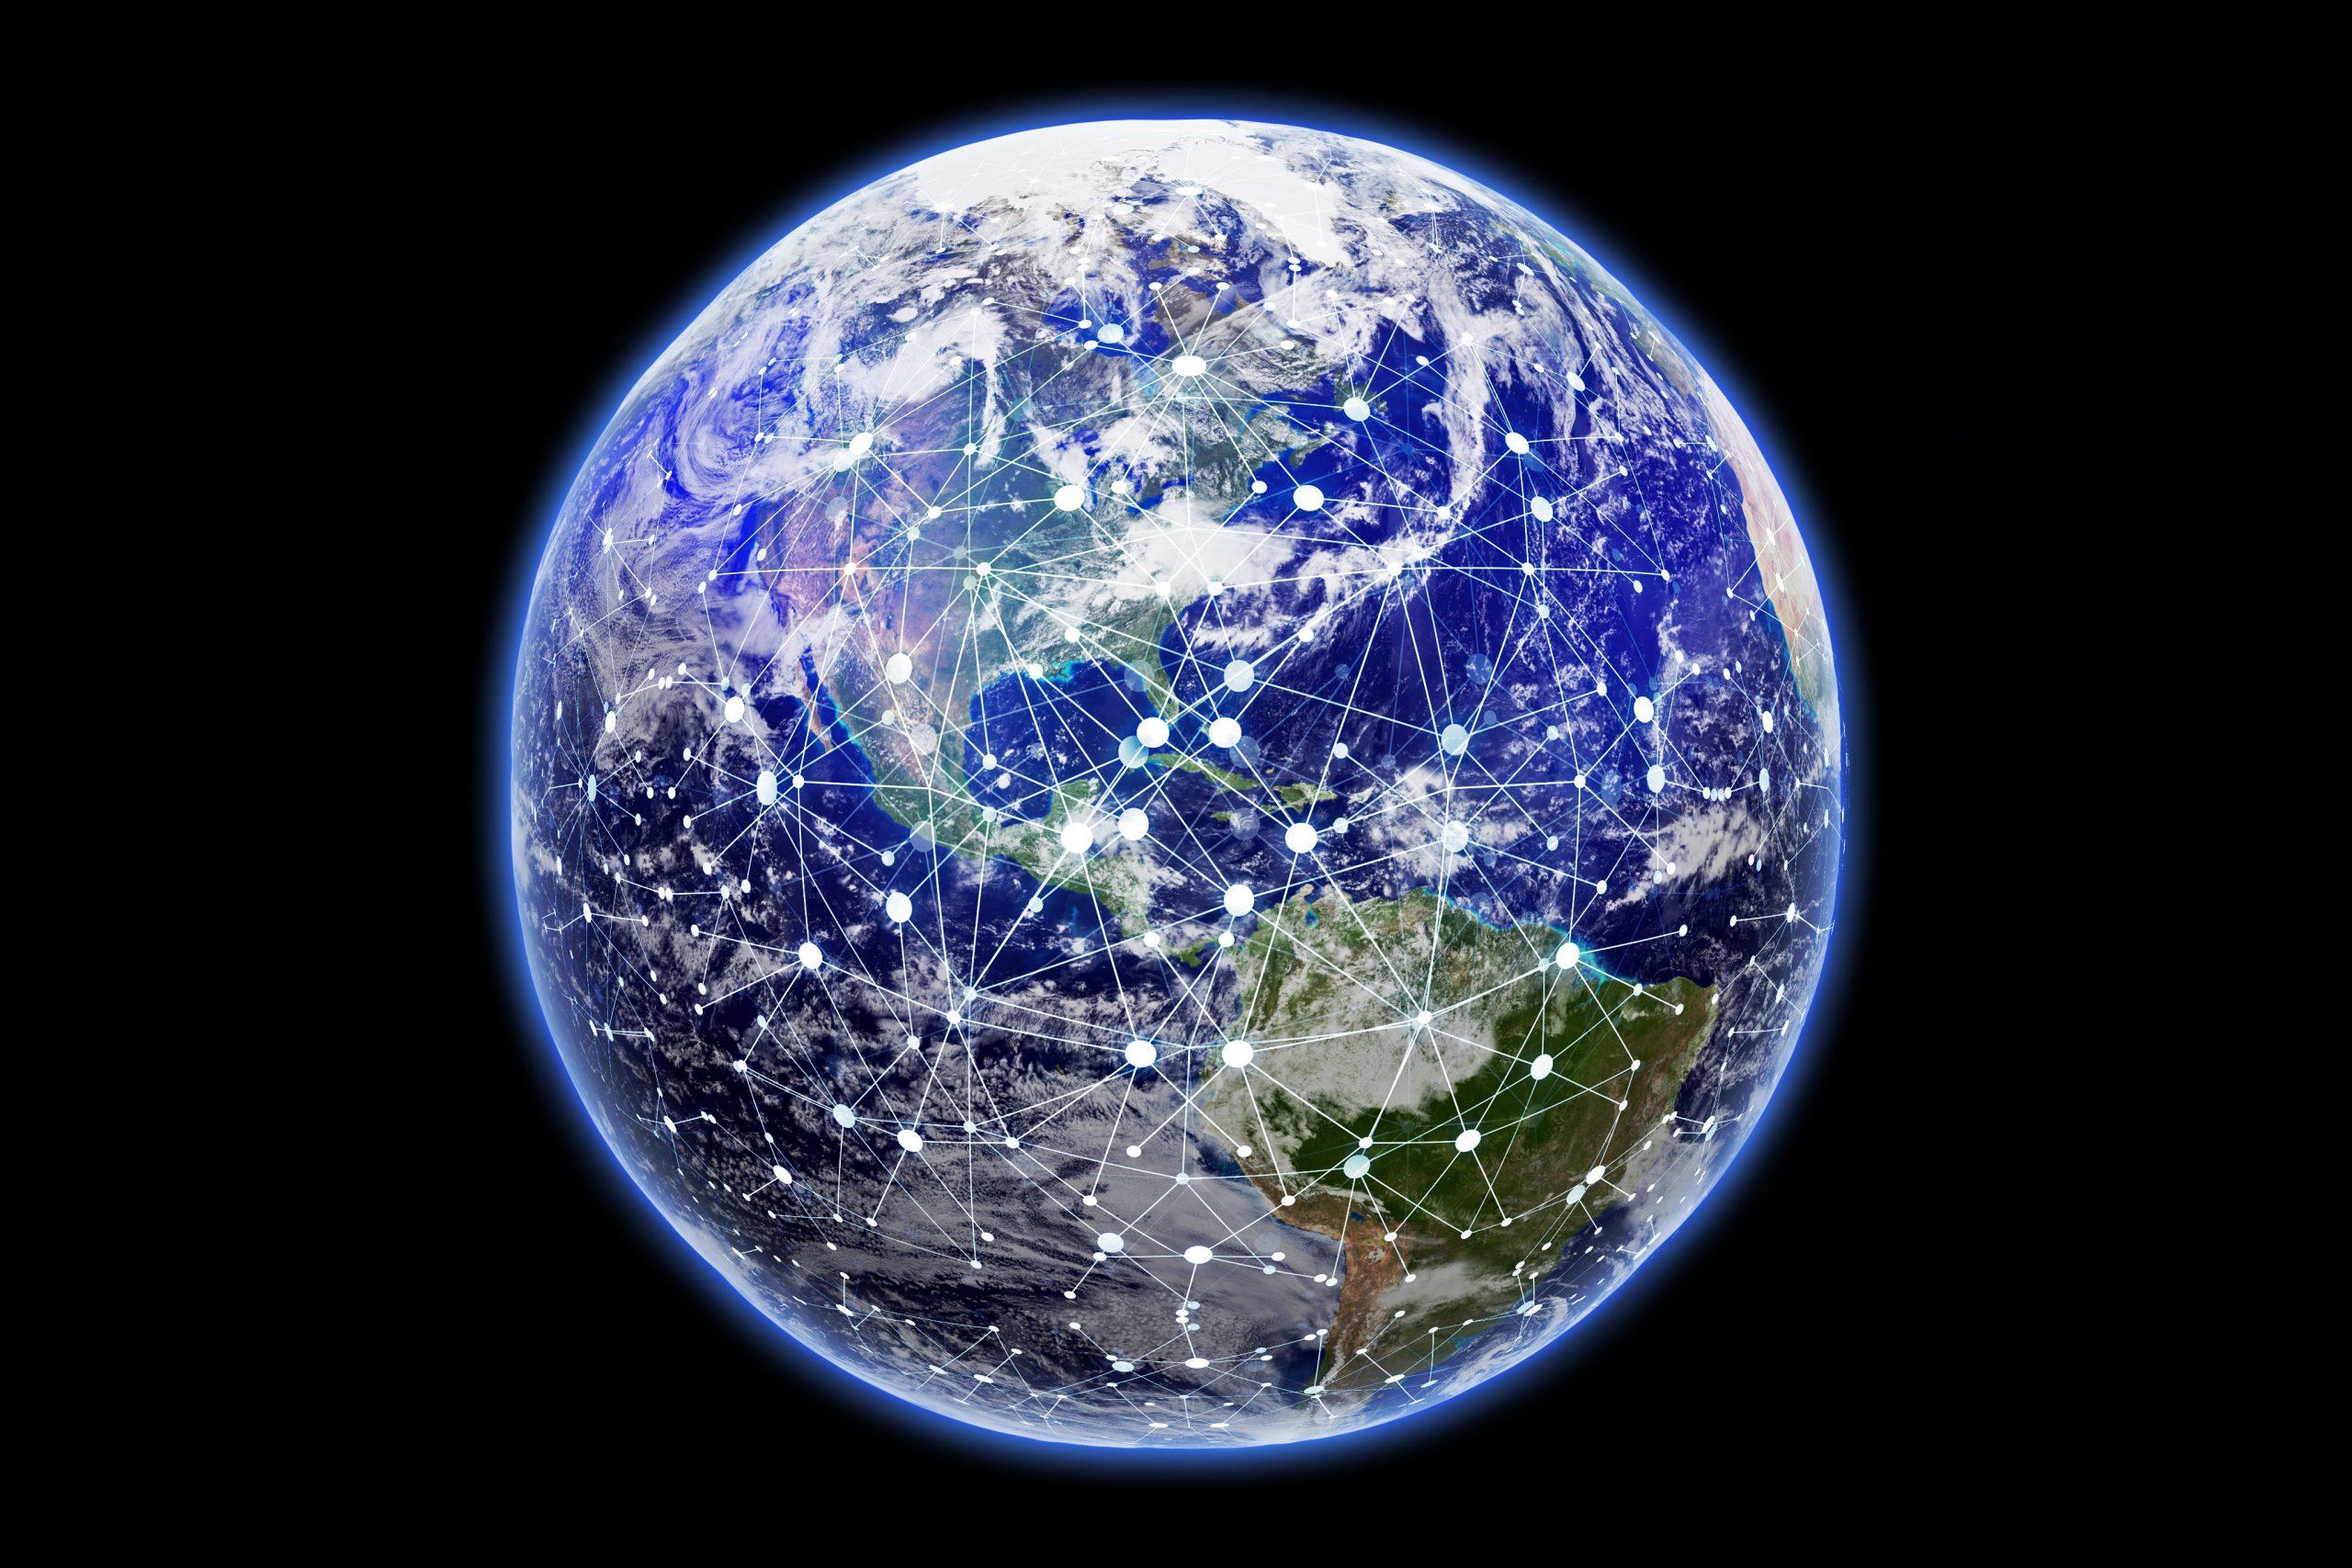 Vernetzte Weltkugel